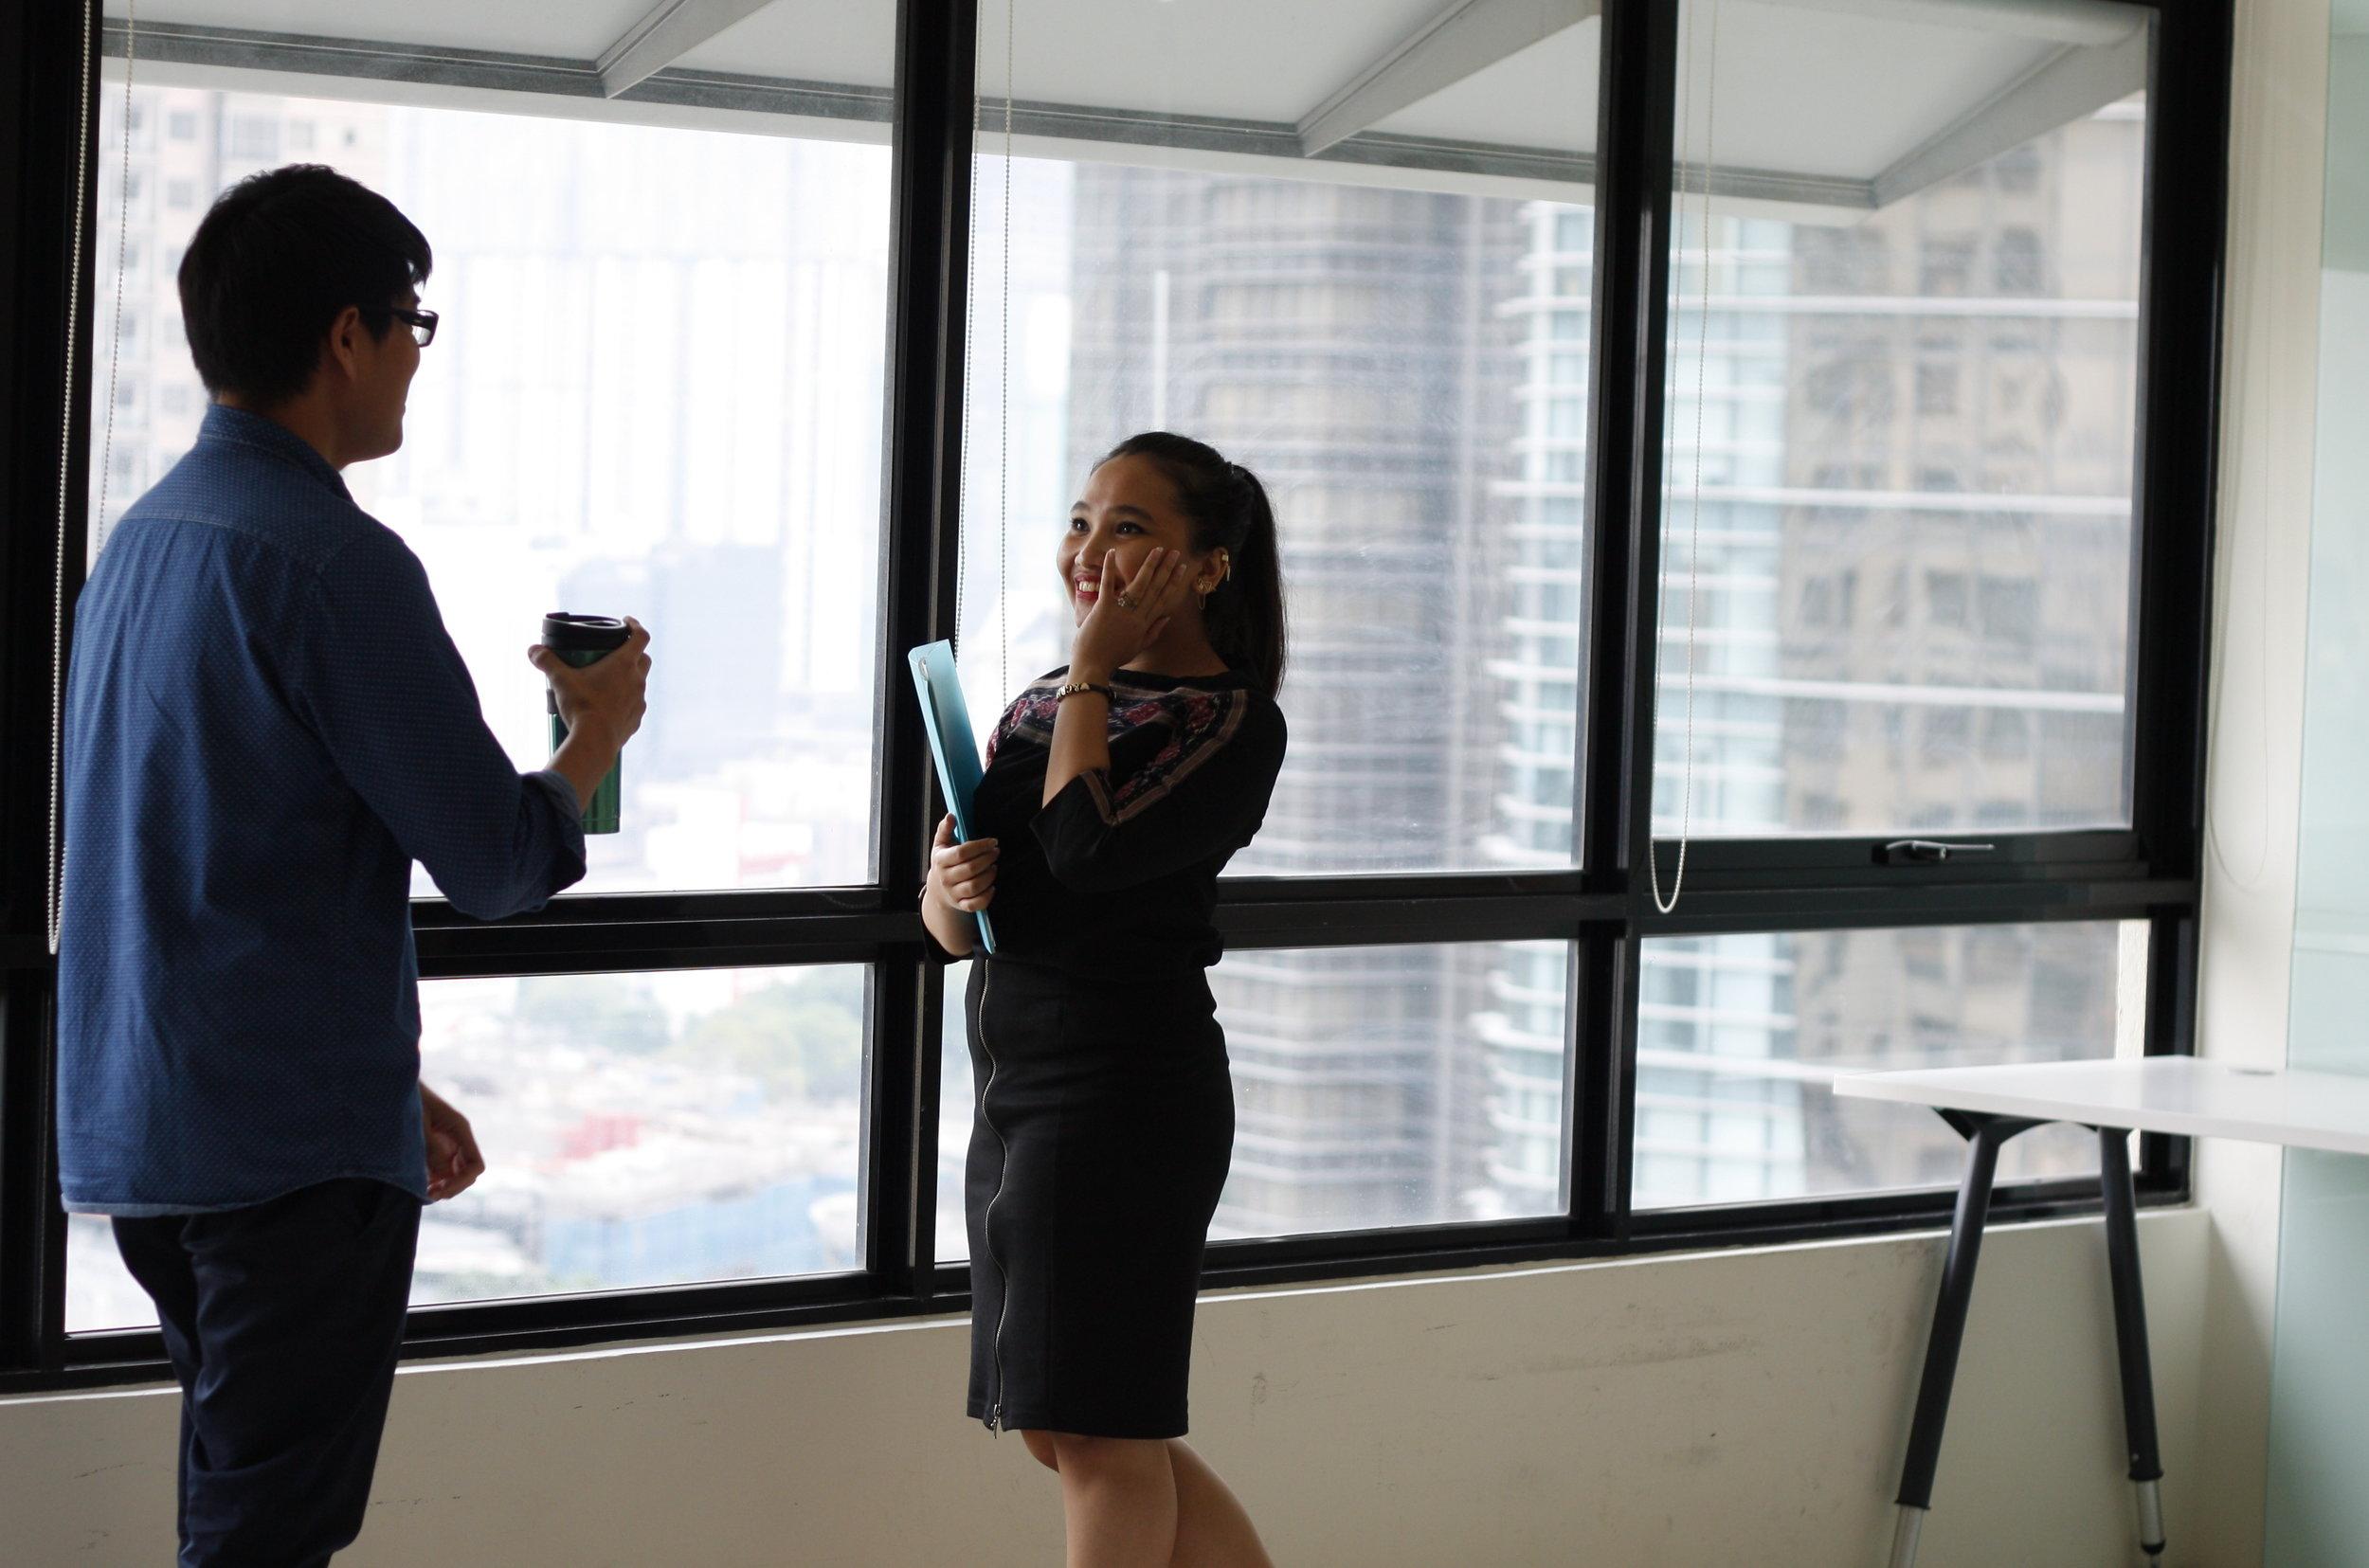 https://www.pexels.com | Man and woman at work